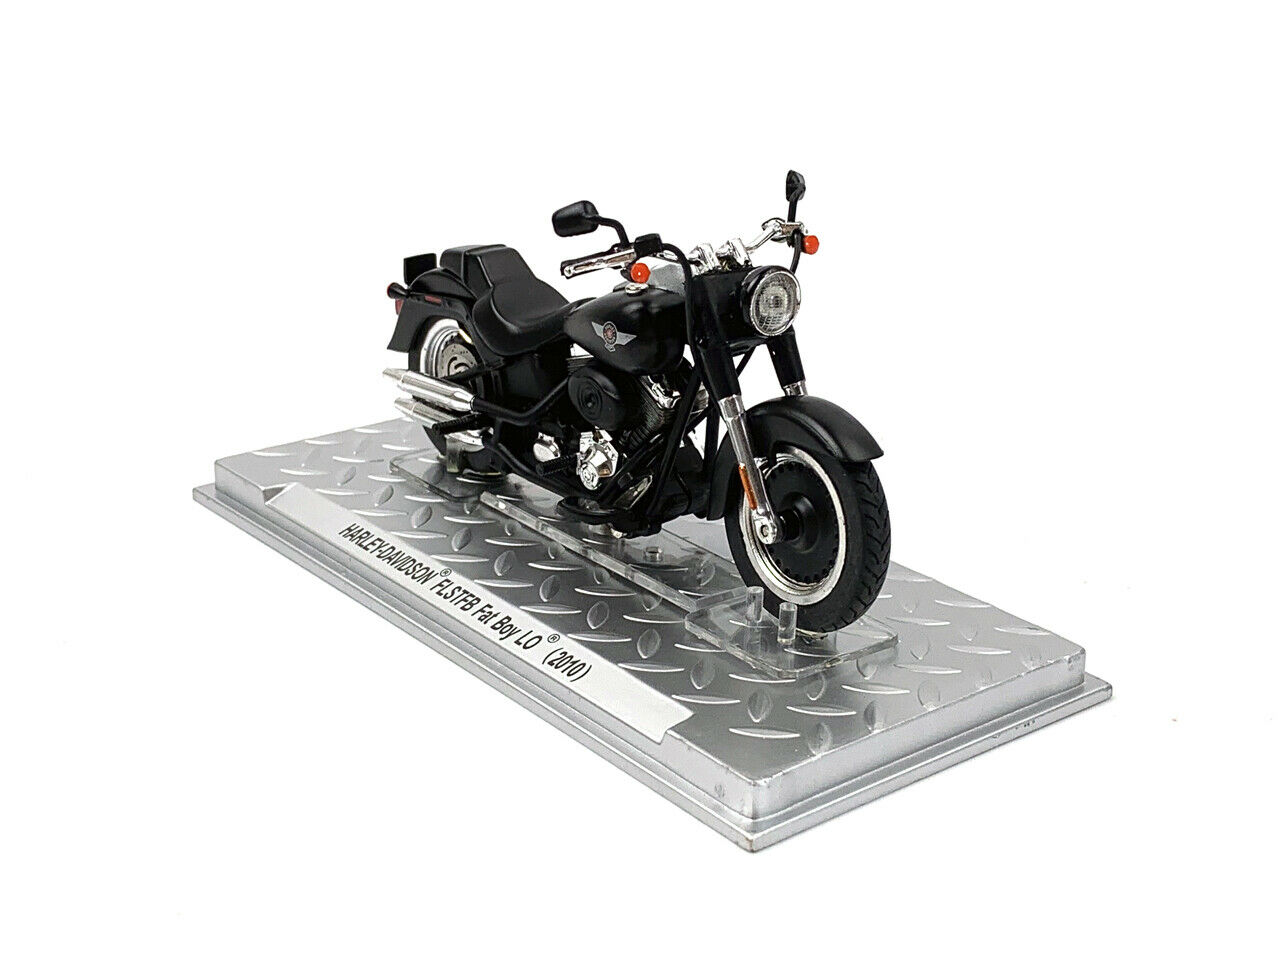 1 24 Harley-Davidson FLSTFB FAT BOY LO 2010 Motorcycle Model